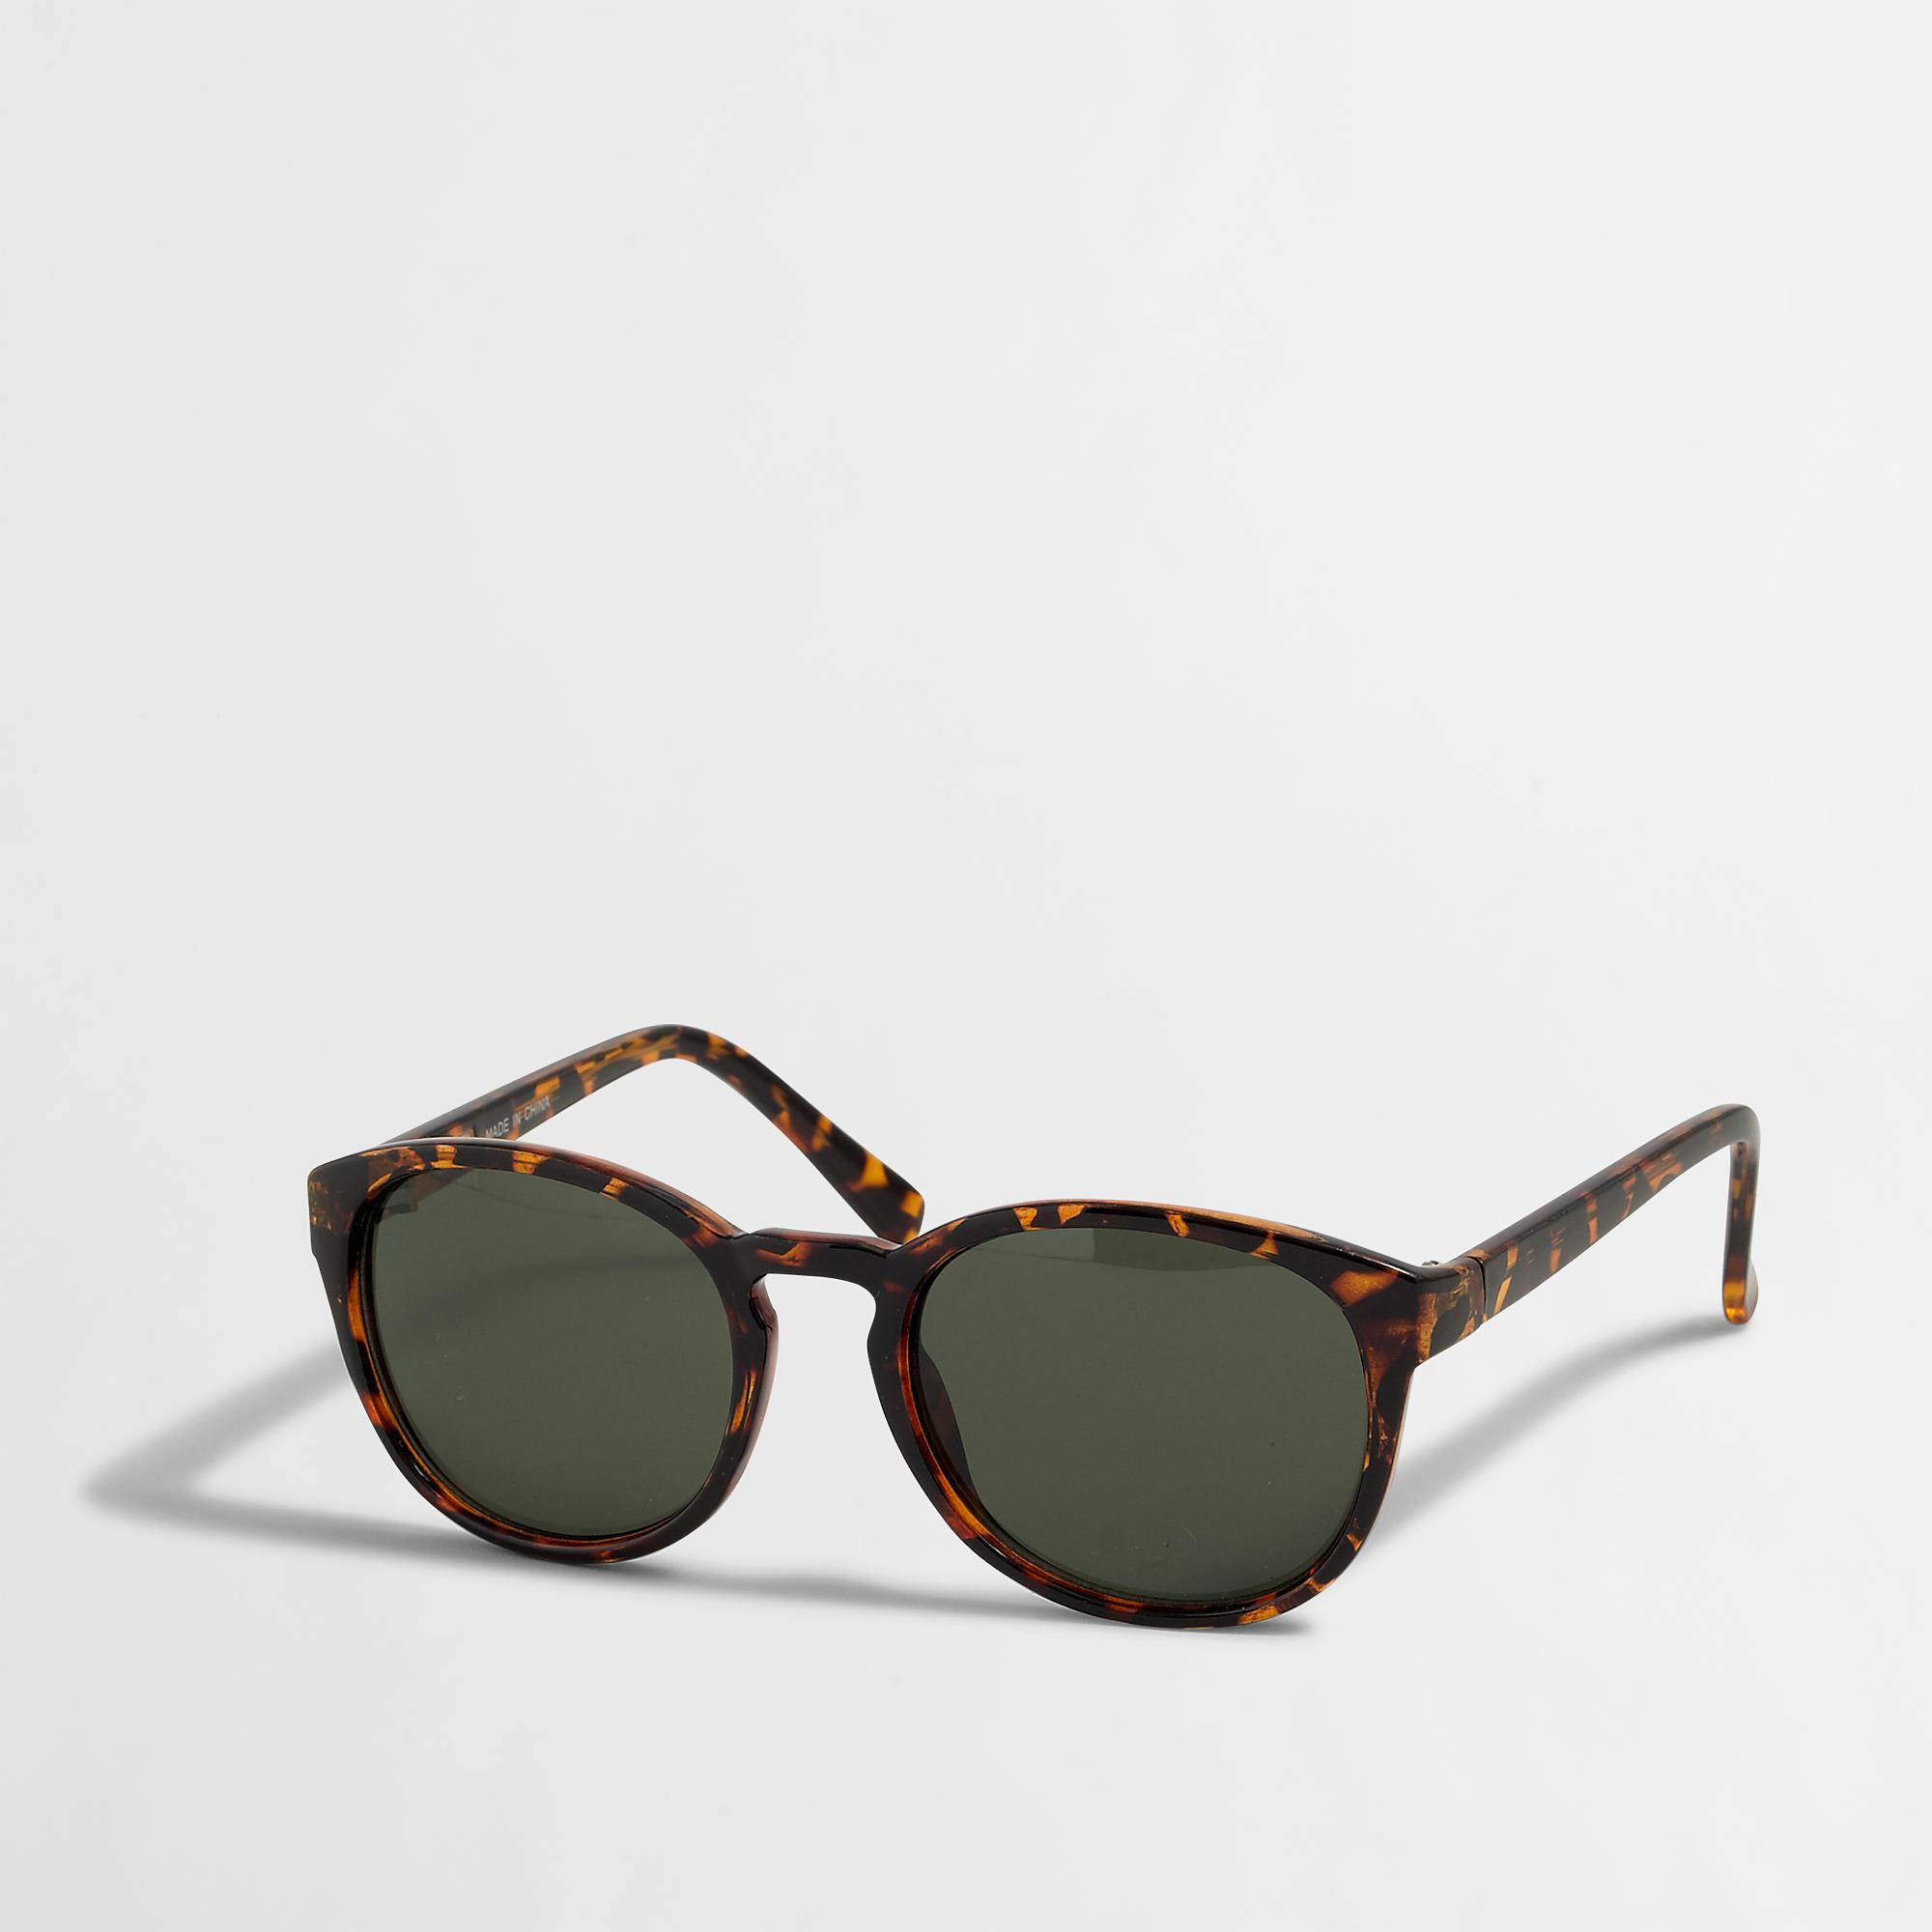 f22c3c6fc7028 J.Crew Black Factory Round Frame Sunglasses for men